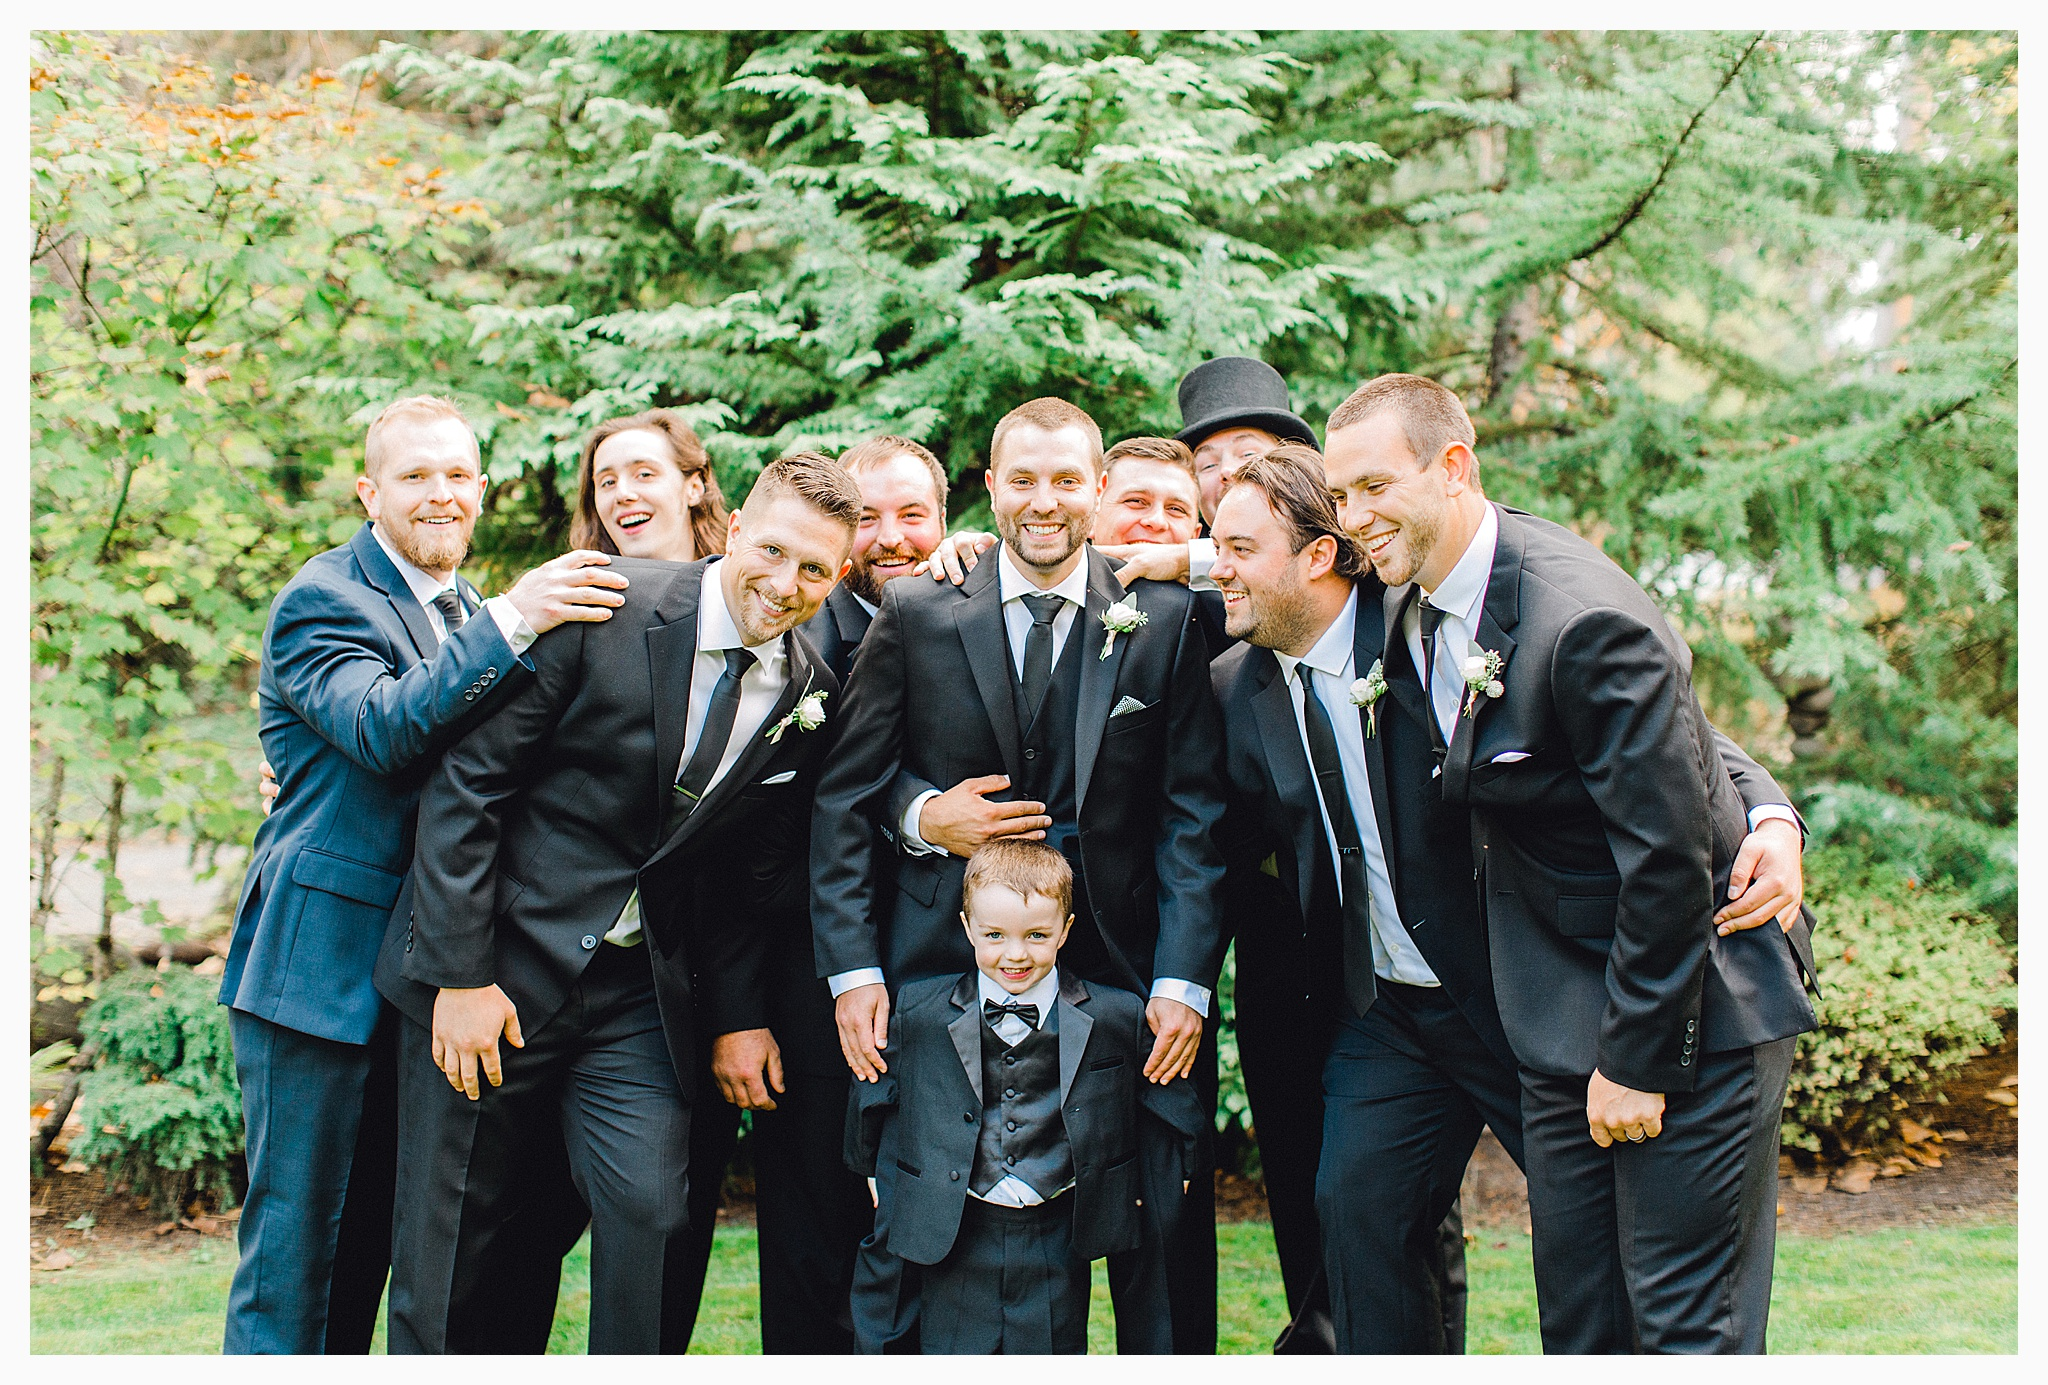 Emma Rose Company Light and Airy Wedding Photographer, Beautiful fall wedding at Rock Creek Gardens Venue in Puyallup, Washington._0058.jpg